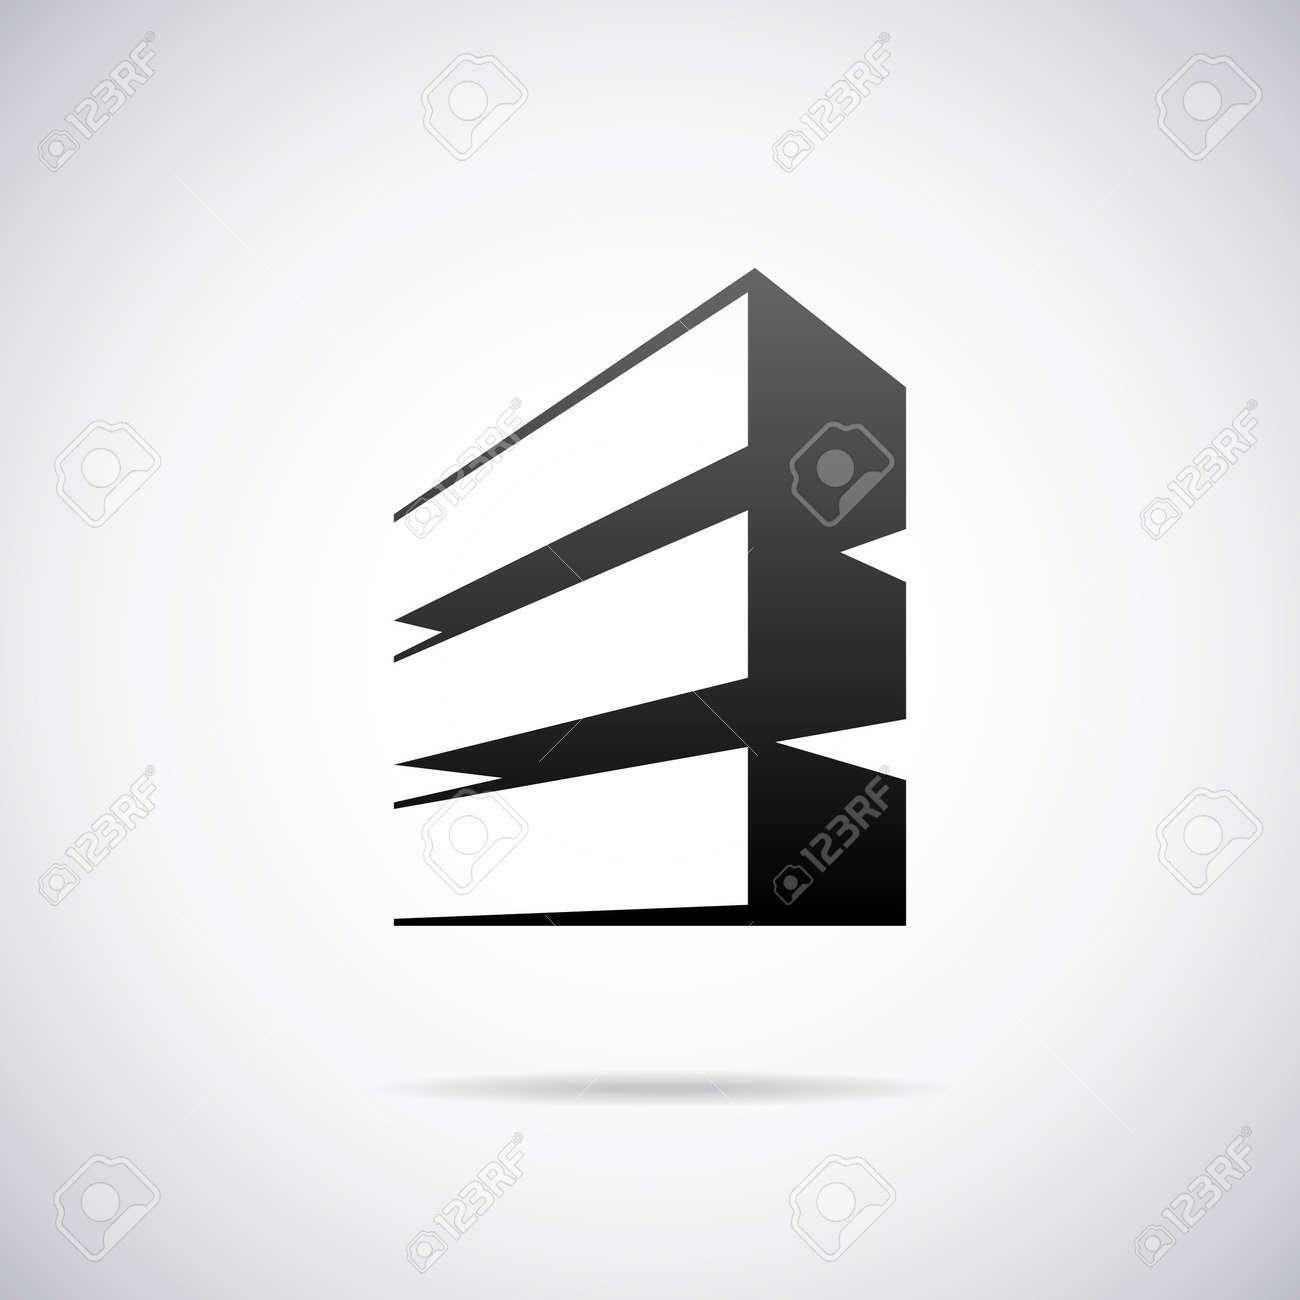 Logo for letter e design template vector illustration royalty free logo for letter e design template vector illustration stock vector 43081125 spiritdancerdesigns Images